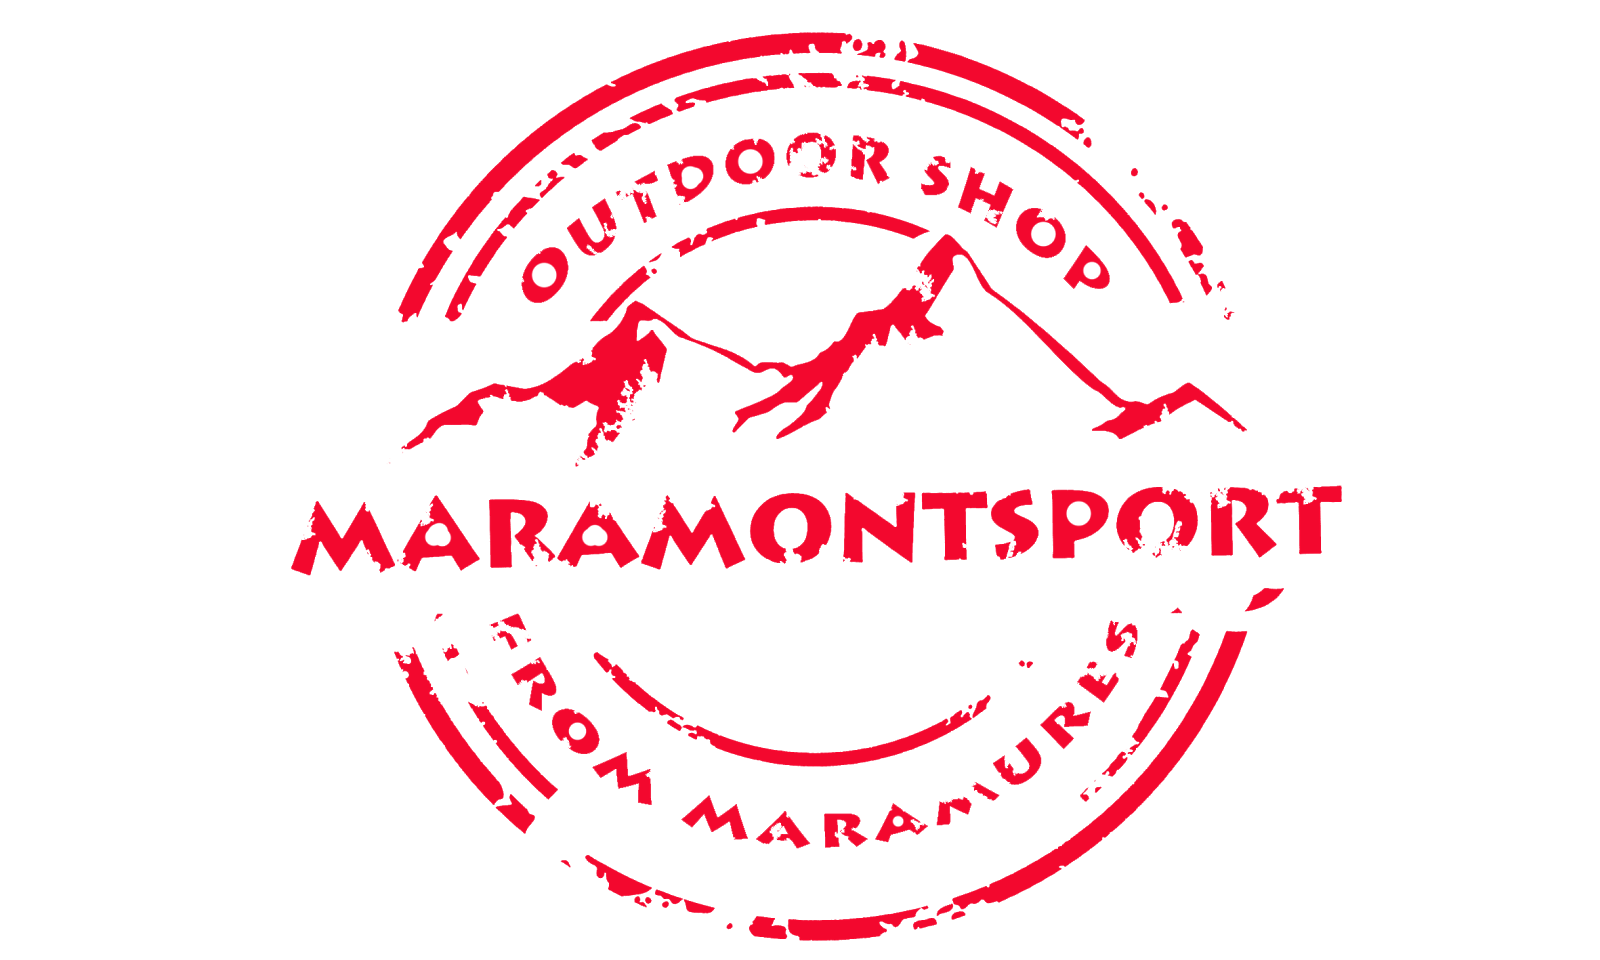 Maramontsport